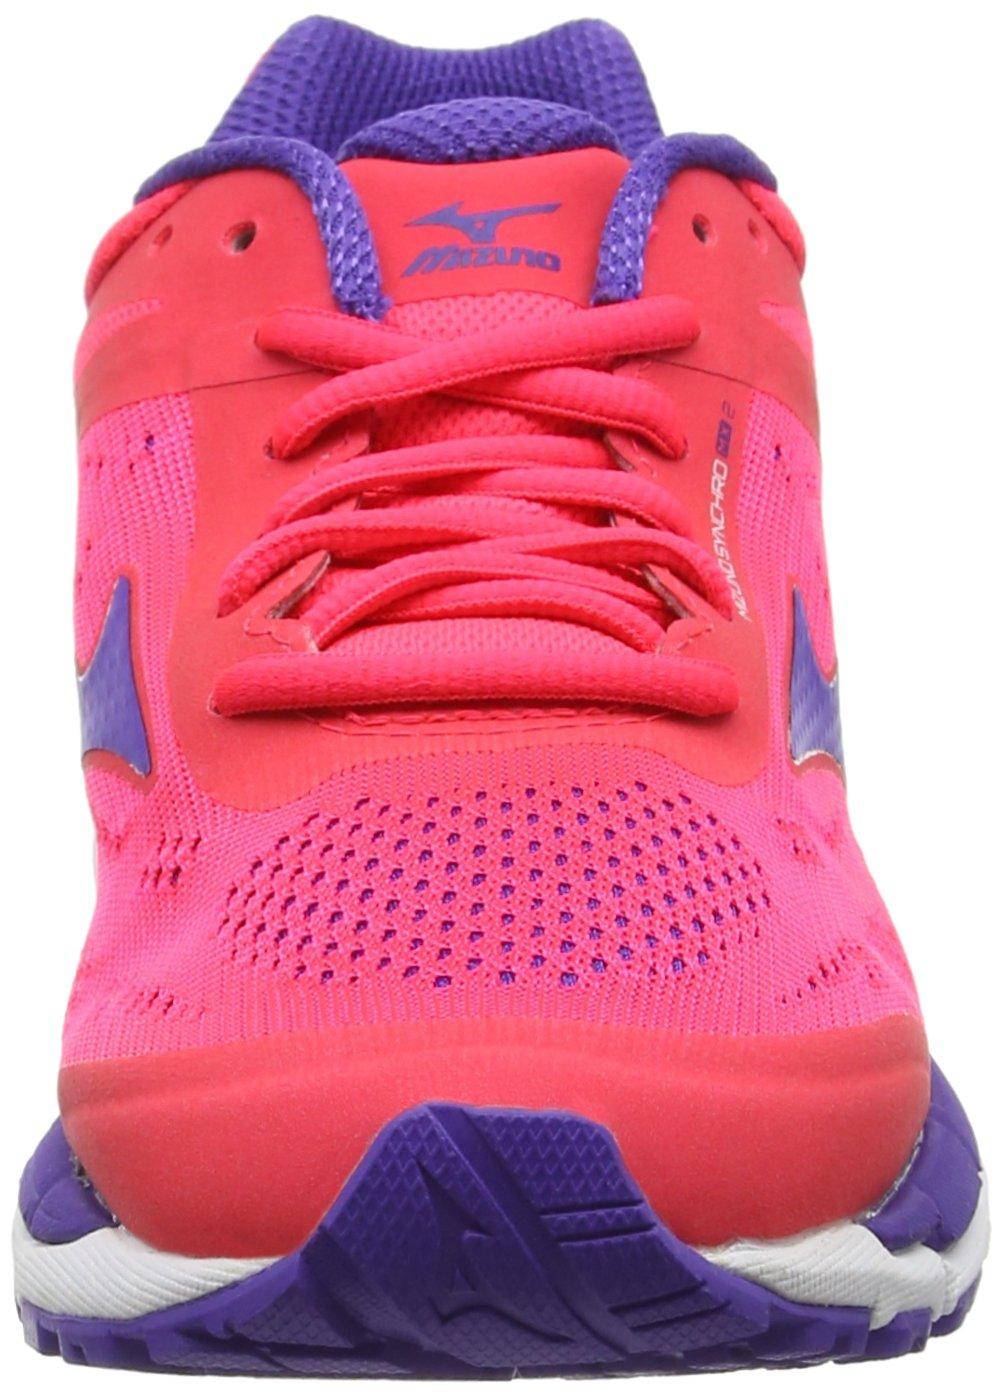 Mizuno Synchro MX 2 (w), Zapatillas de Running para Mujer, Rosa (Diva Pink/Liberty/White), 36.5 EU: MainApps: Amazon.es: Zapatos y complementos